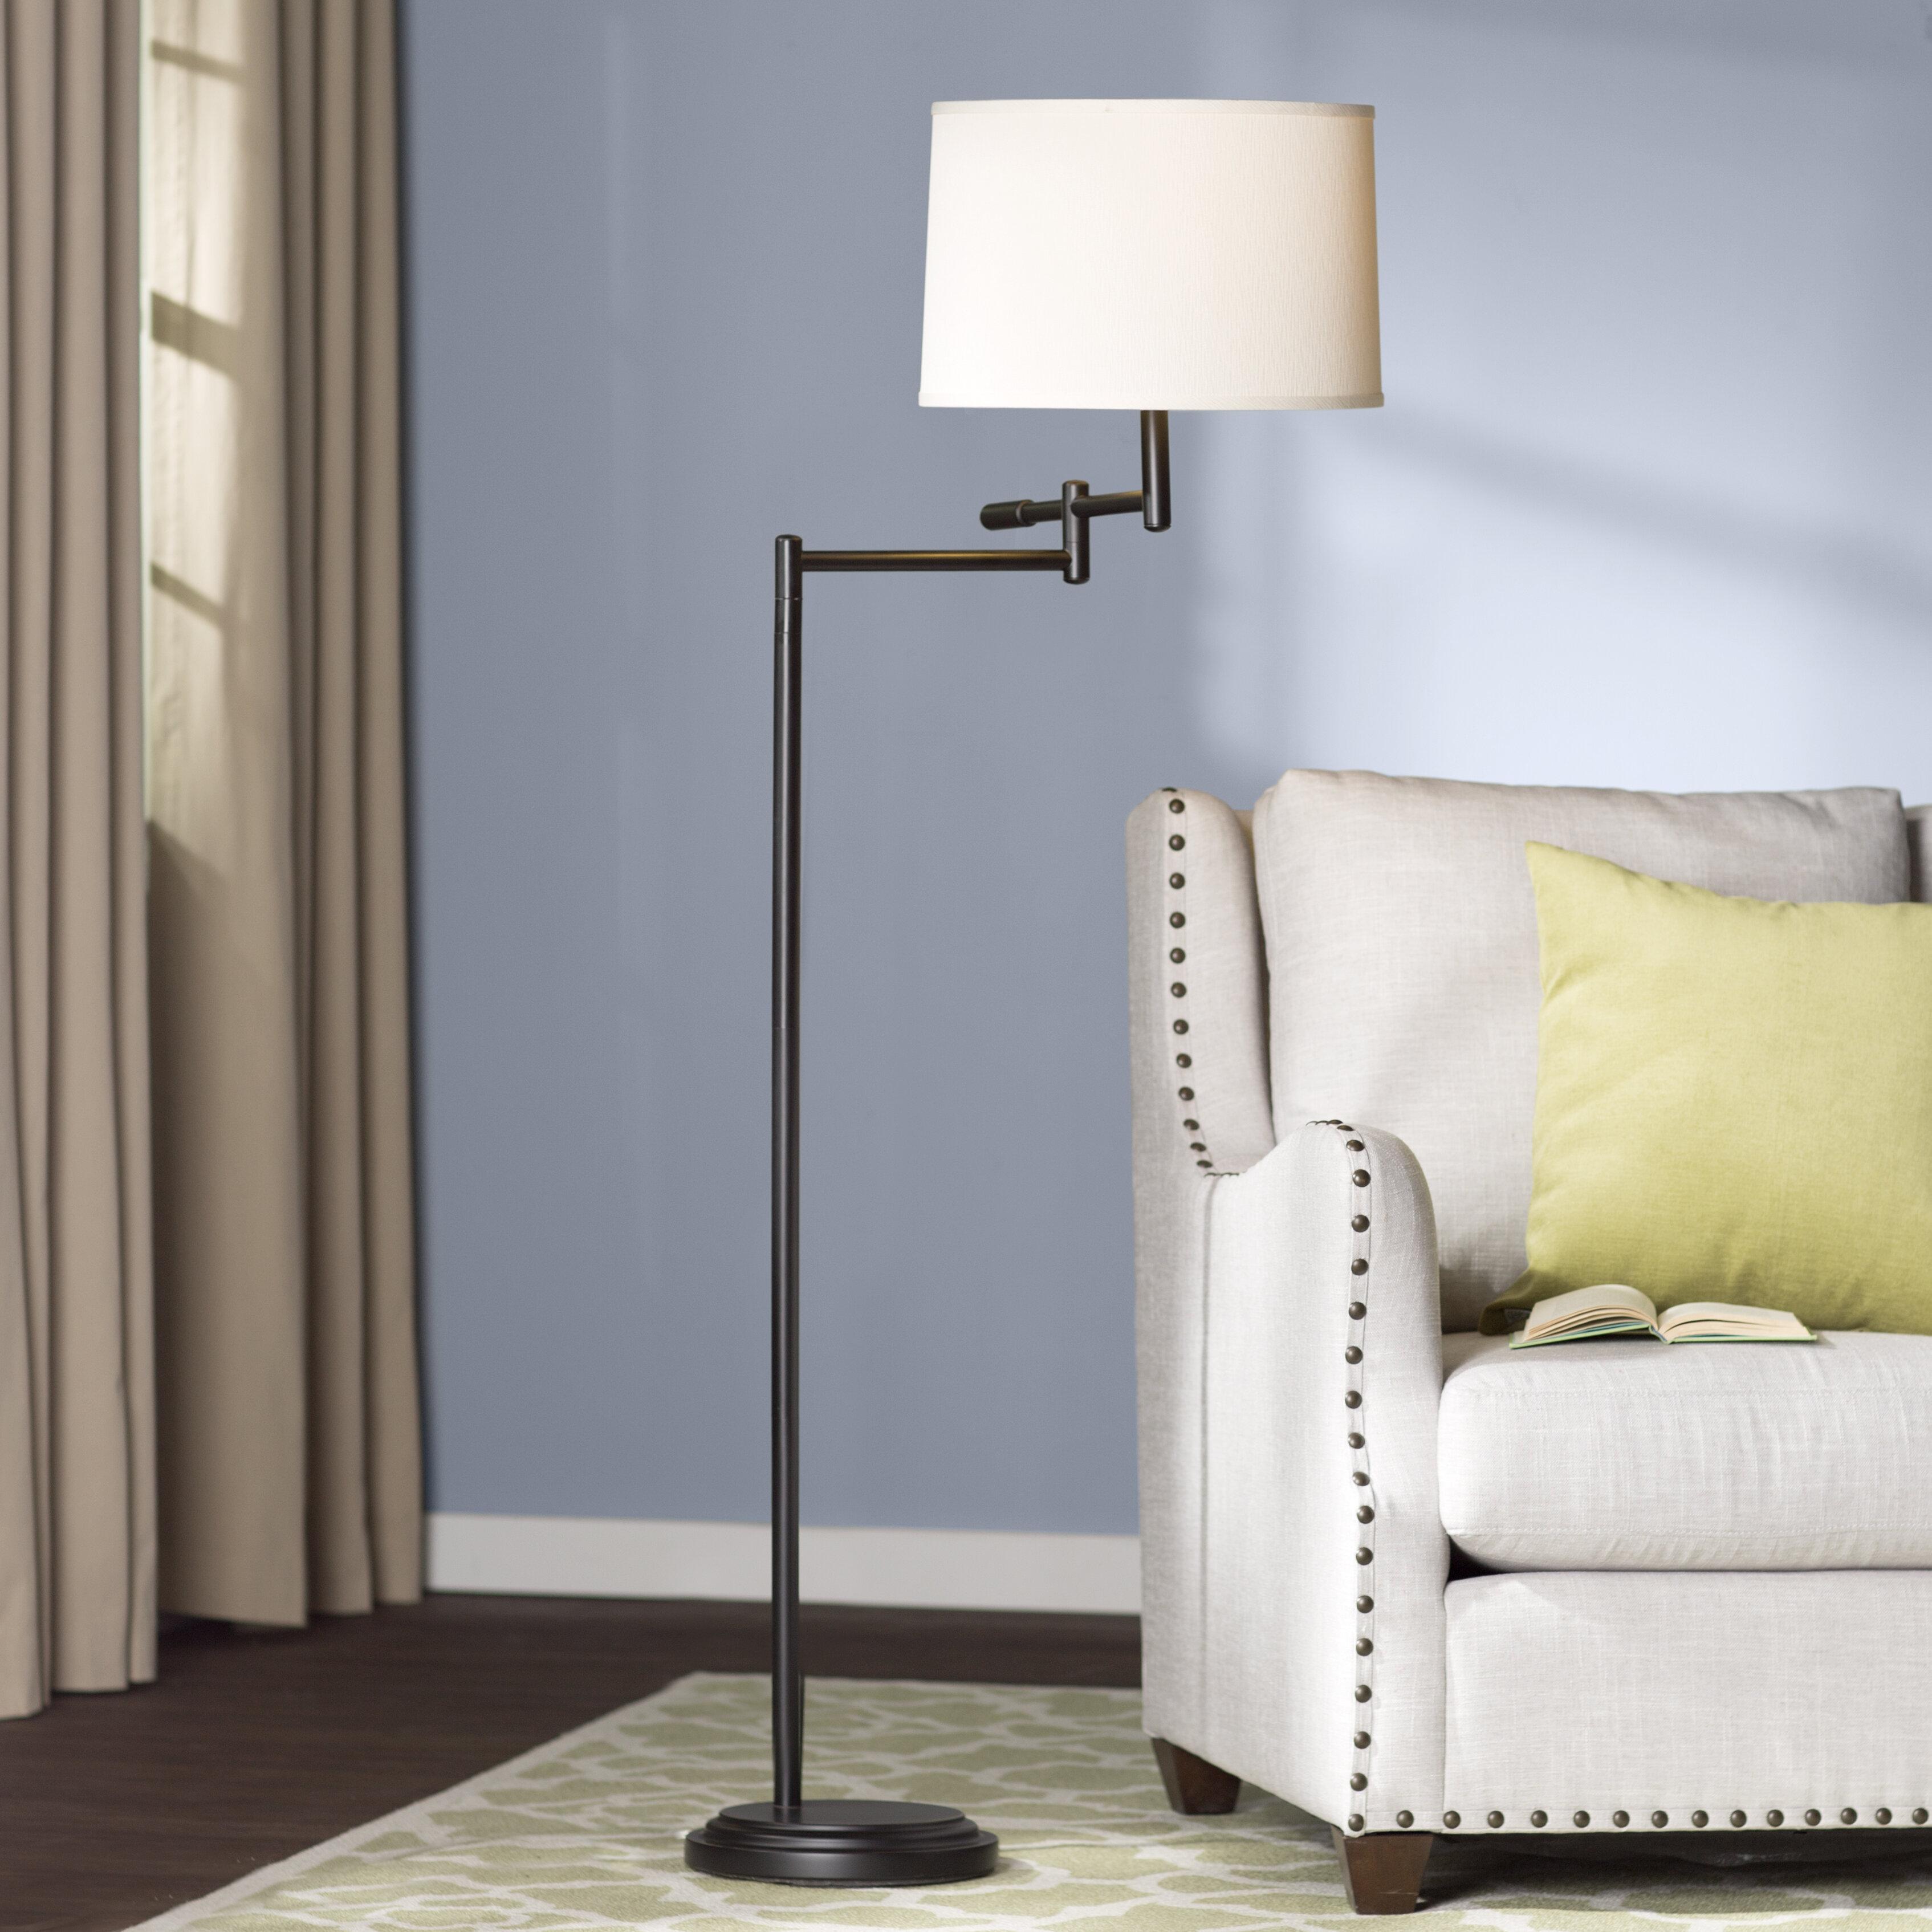 Lilo 60 Swing Arm Floor Lamp Reviews Joss Main